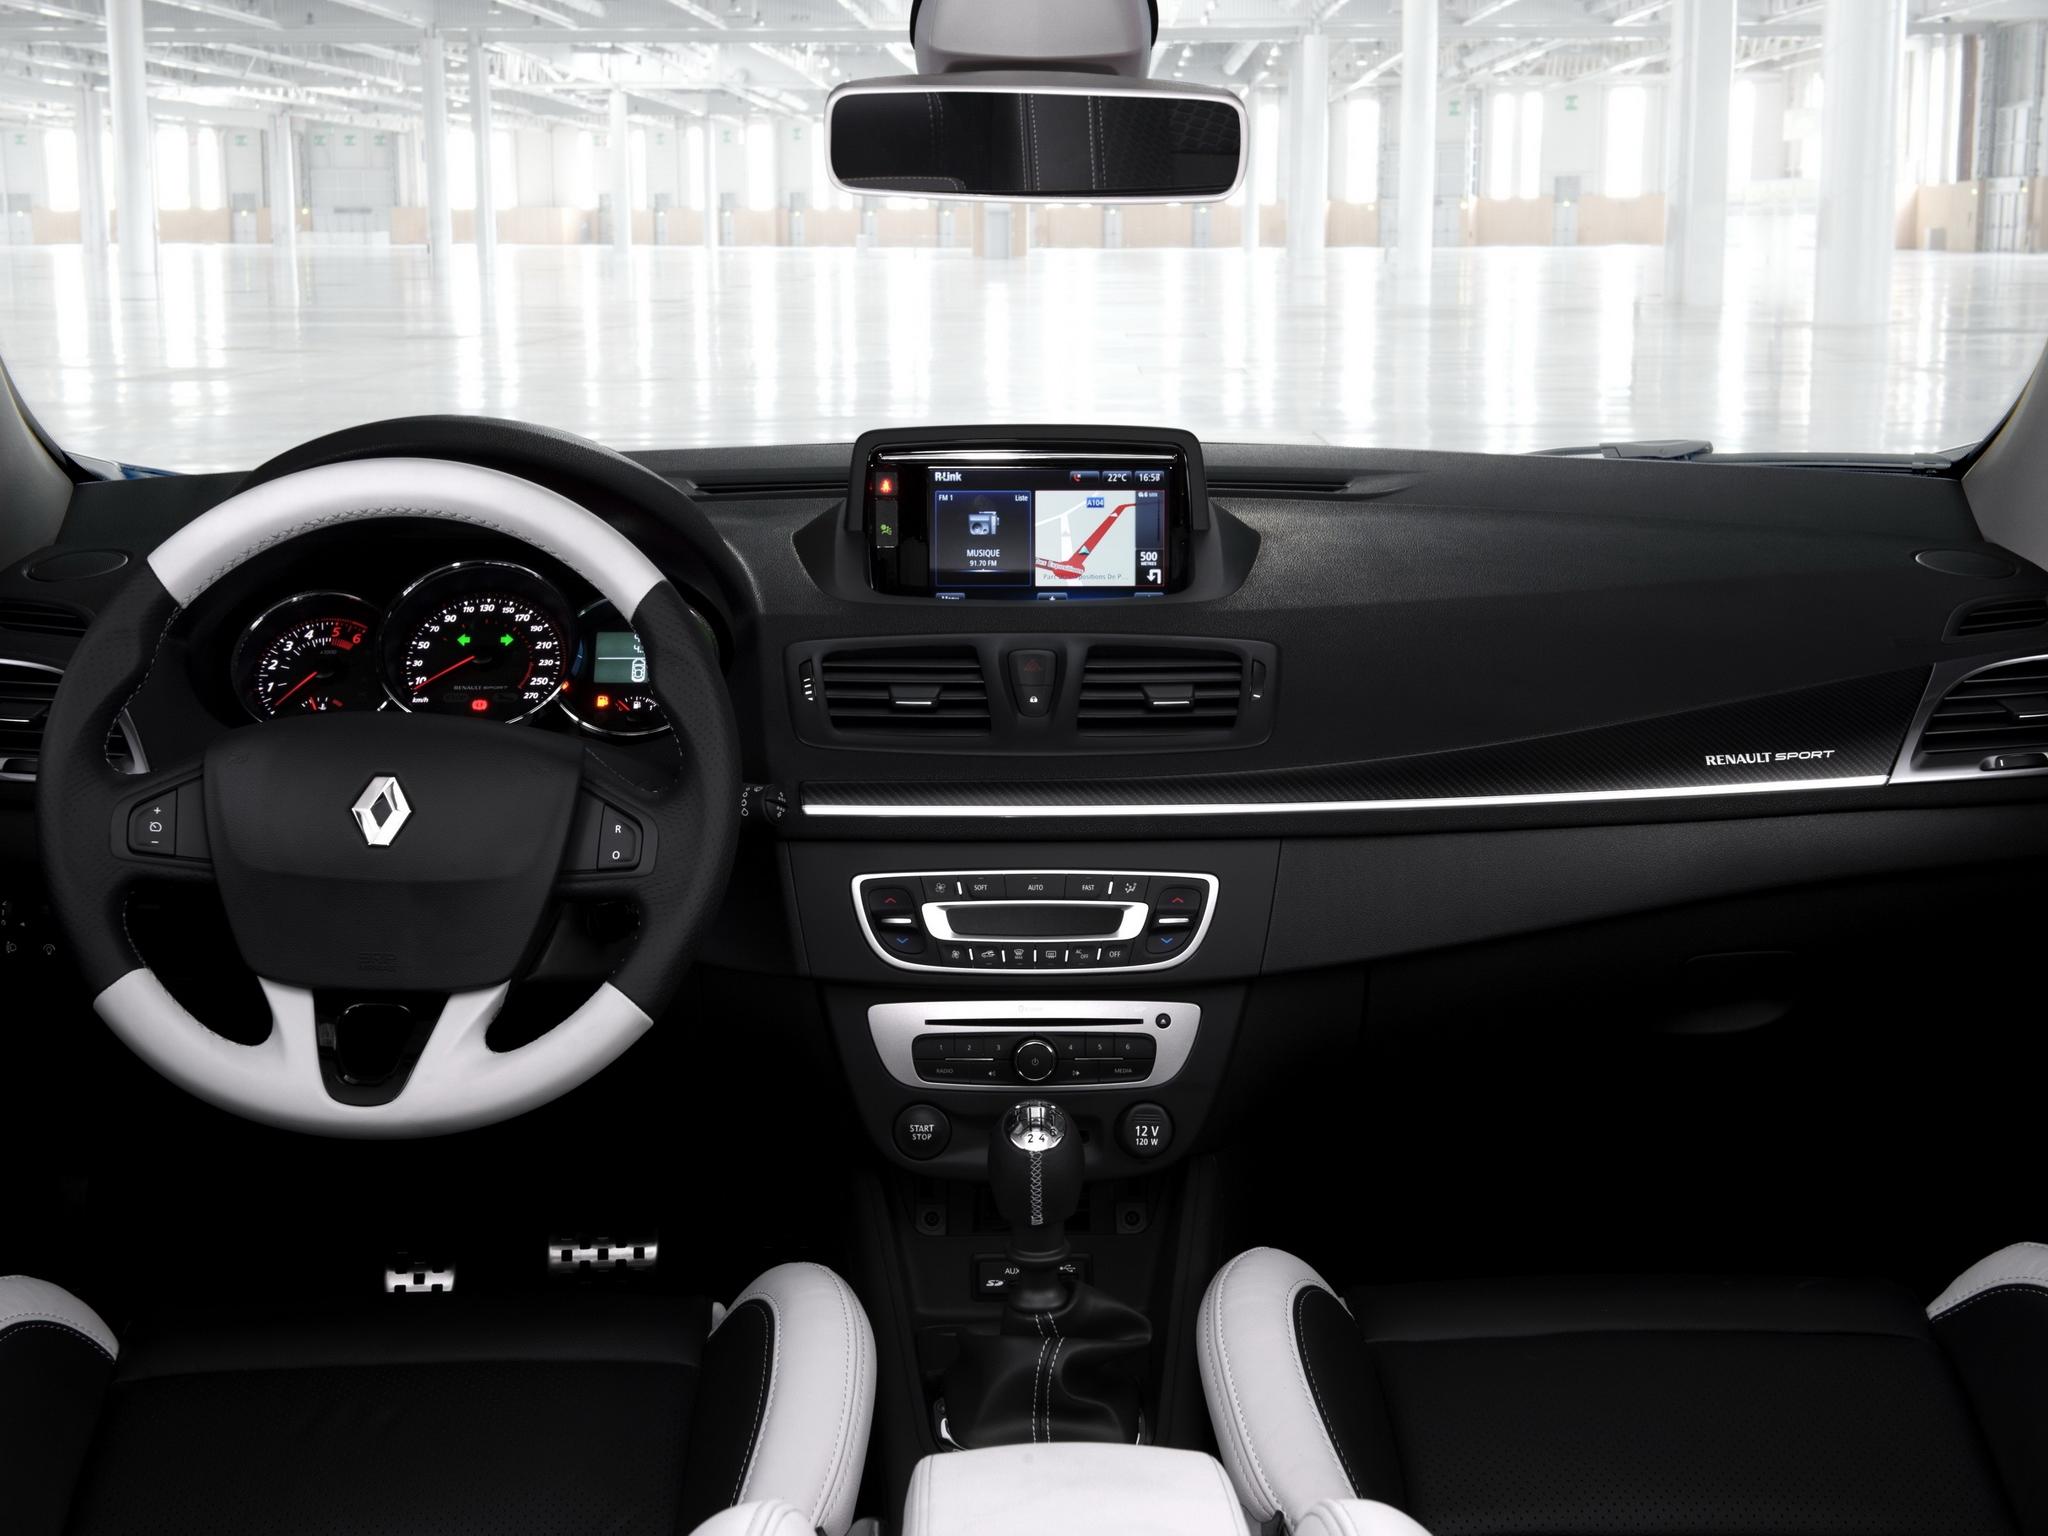 Renault Megane Interior 2014 2014 Renault Megane g t Coupe